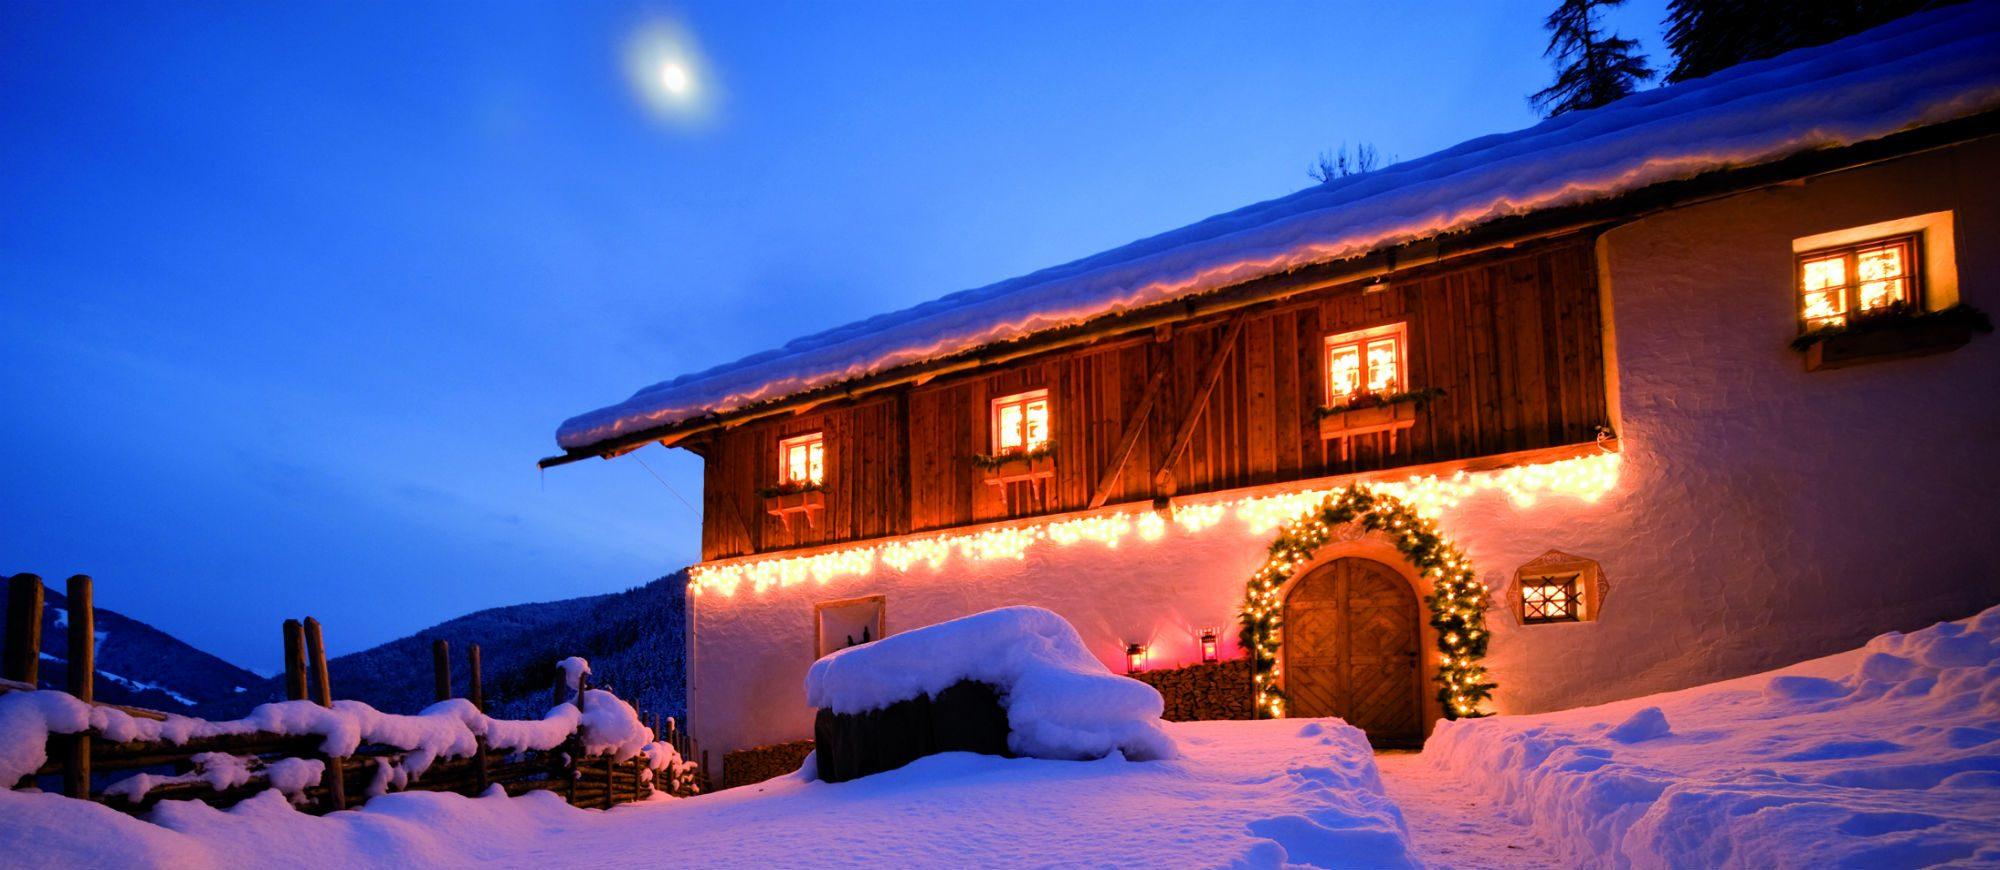 whitedeer-main1-property-winter-1